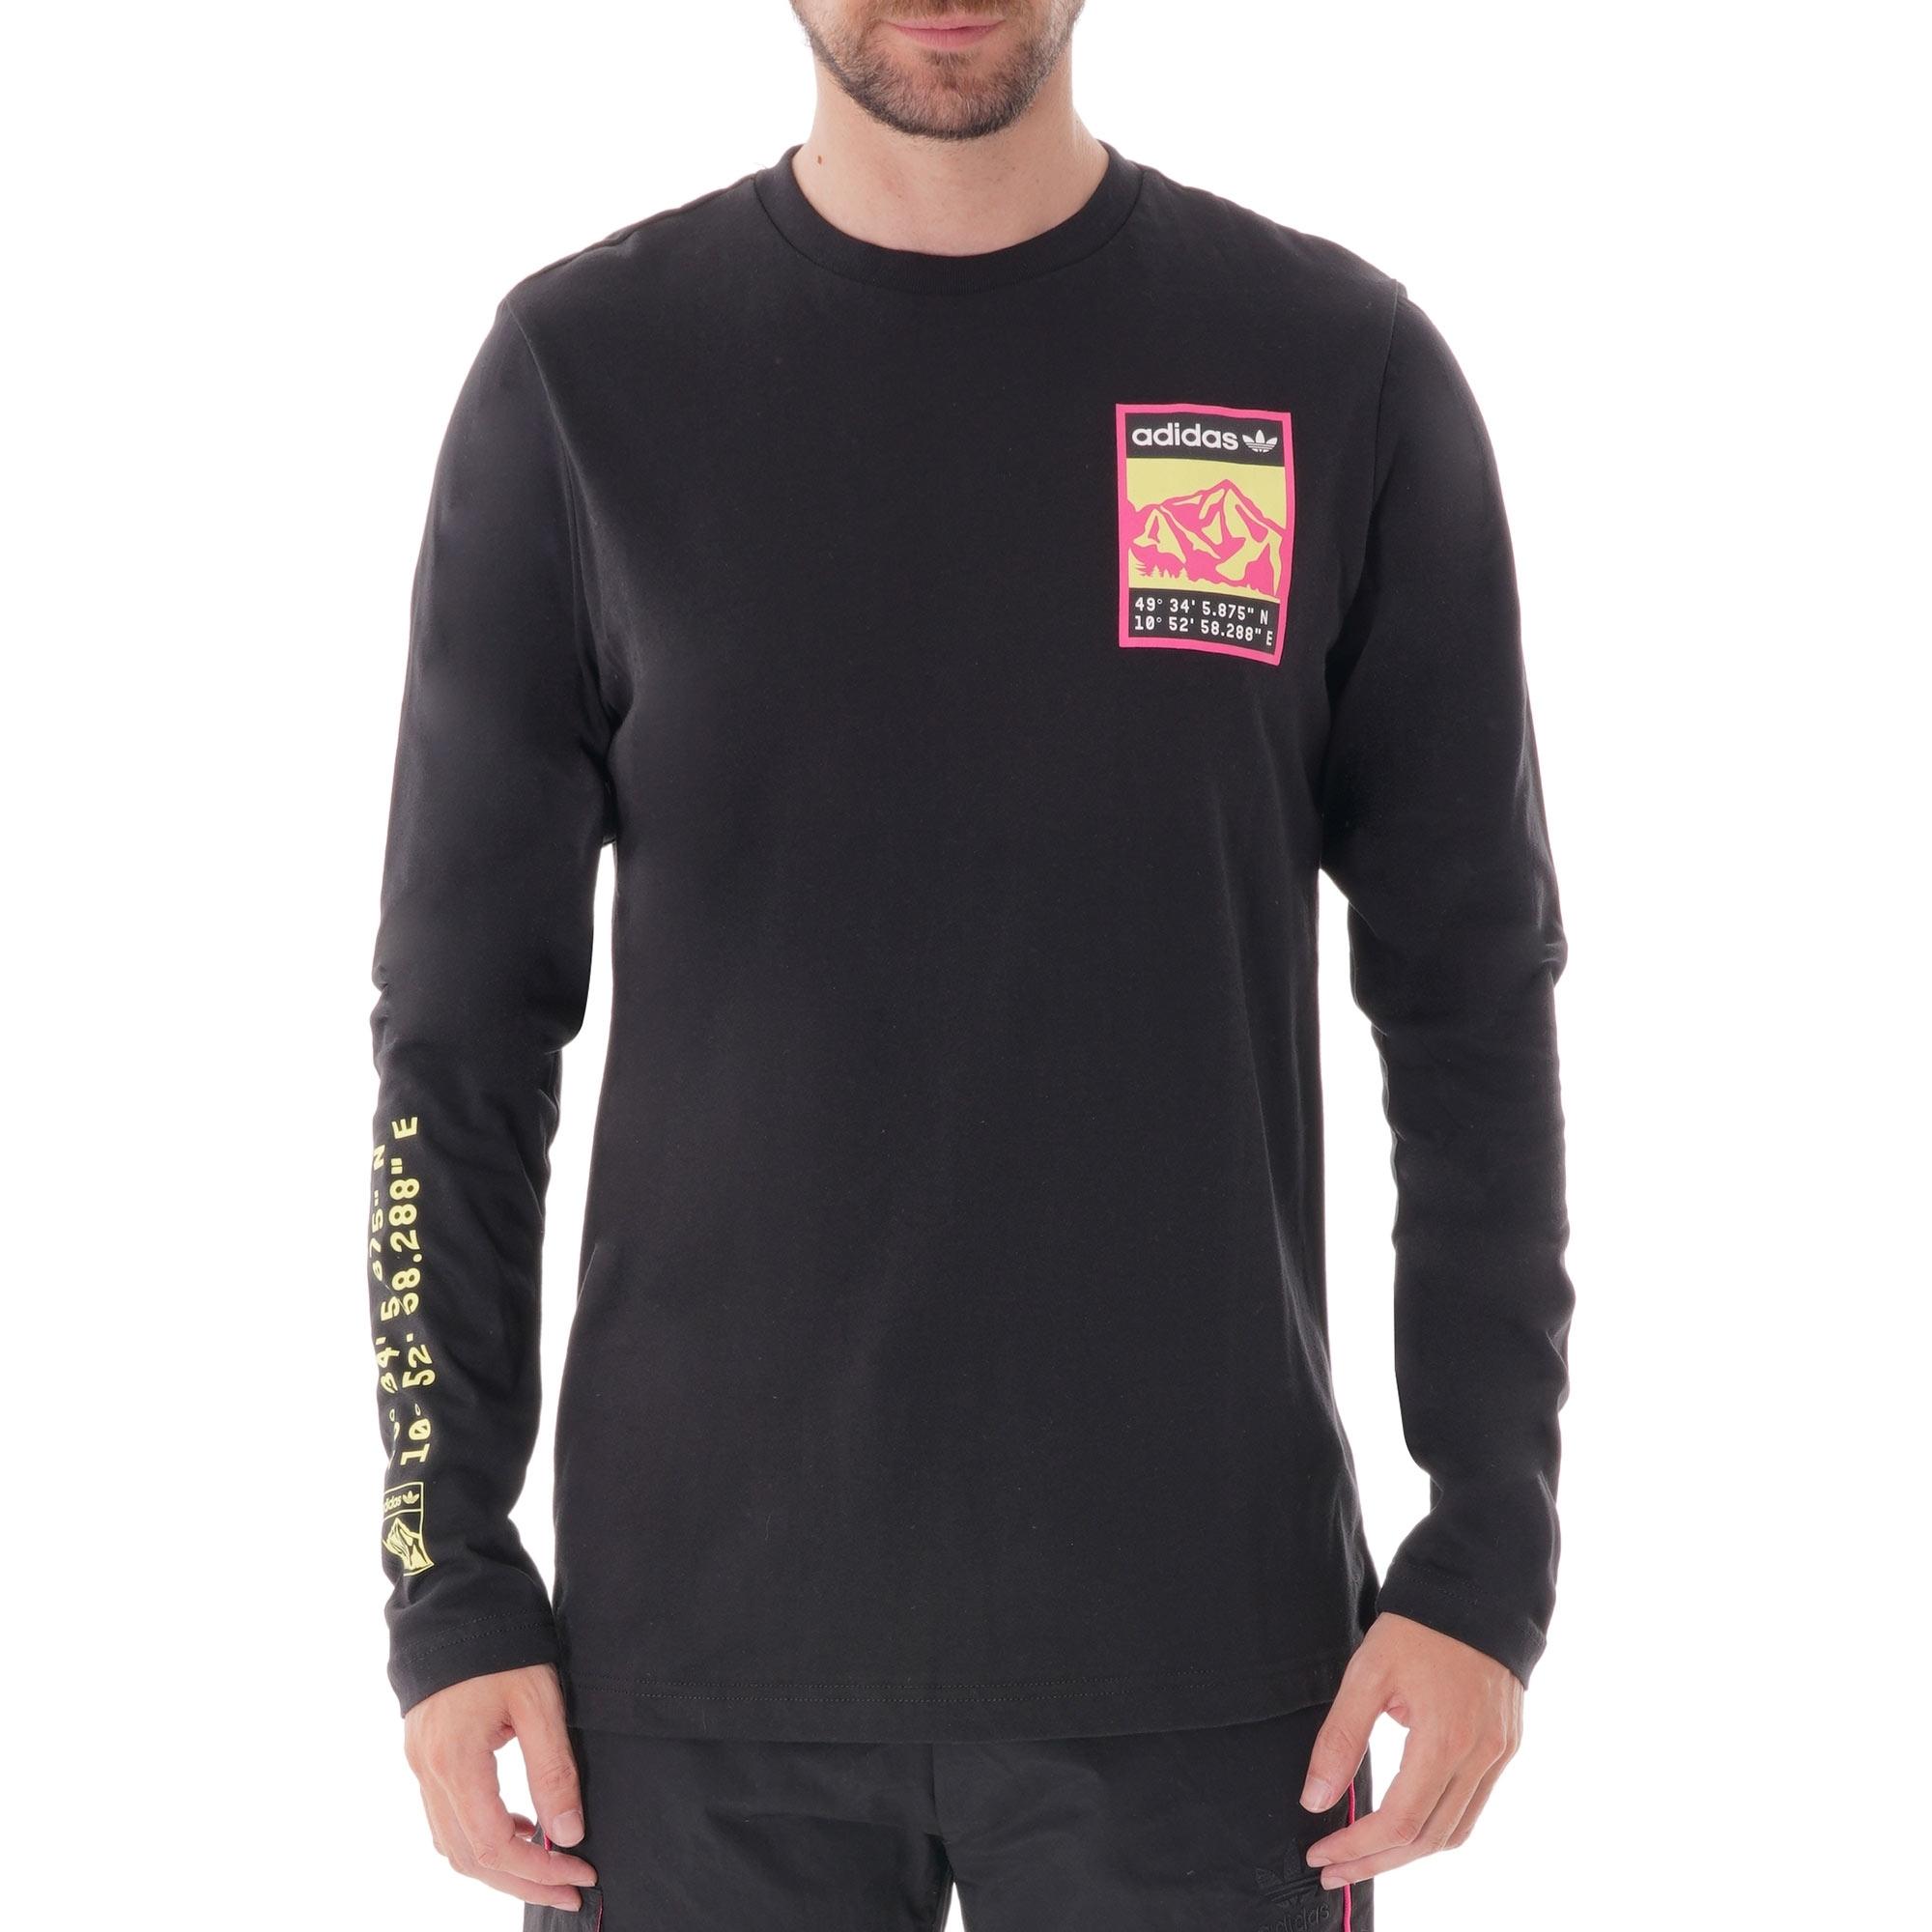 adidas mountain shirt